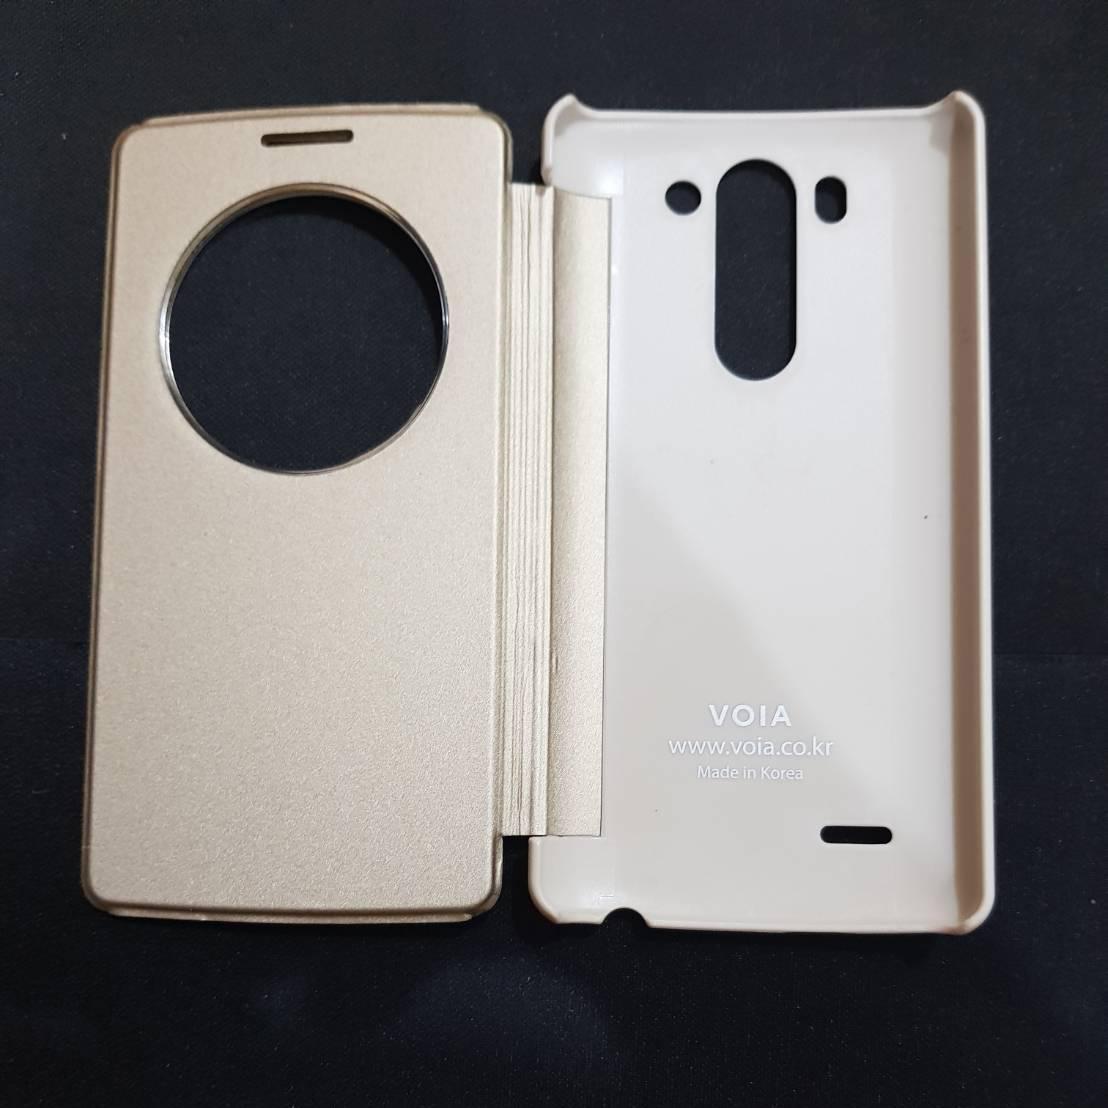 LG G3 Beat PREMIUM Flip Casing Case Hp Cover D728 D724 Tebal Gold Full Auto Lama Murah Terbaik | Lazada Indonesia